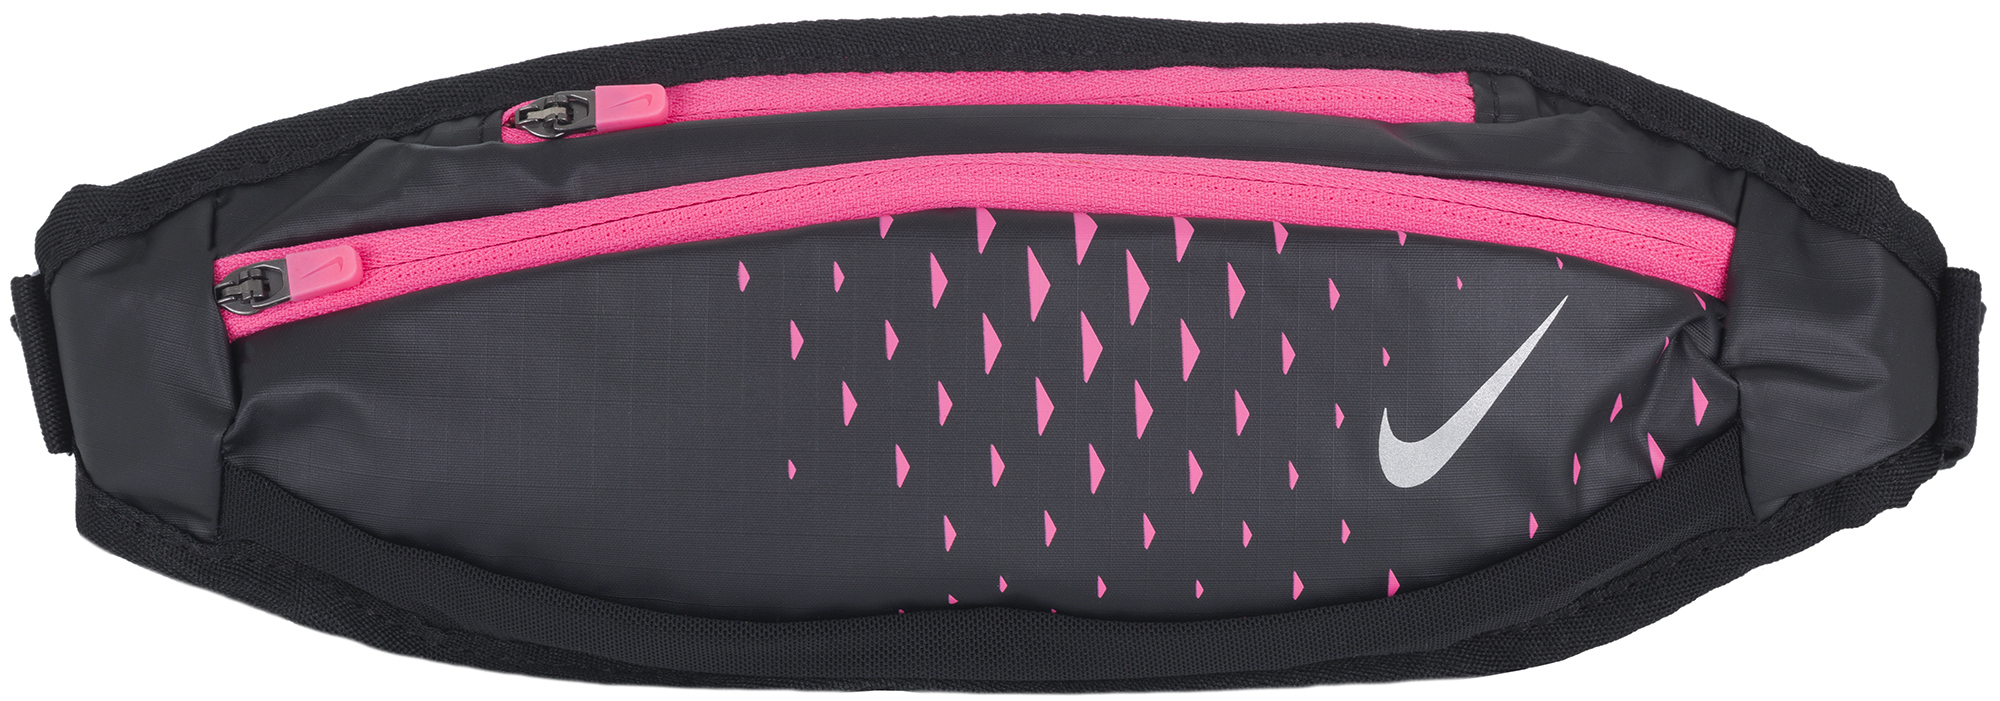 Nike Сумка на пояс женская Nike сумка пояс для инструментов